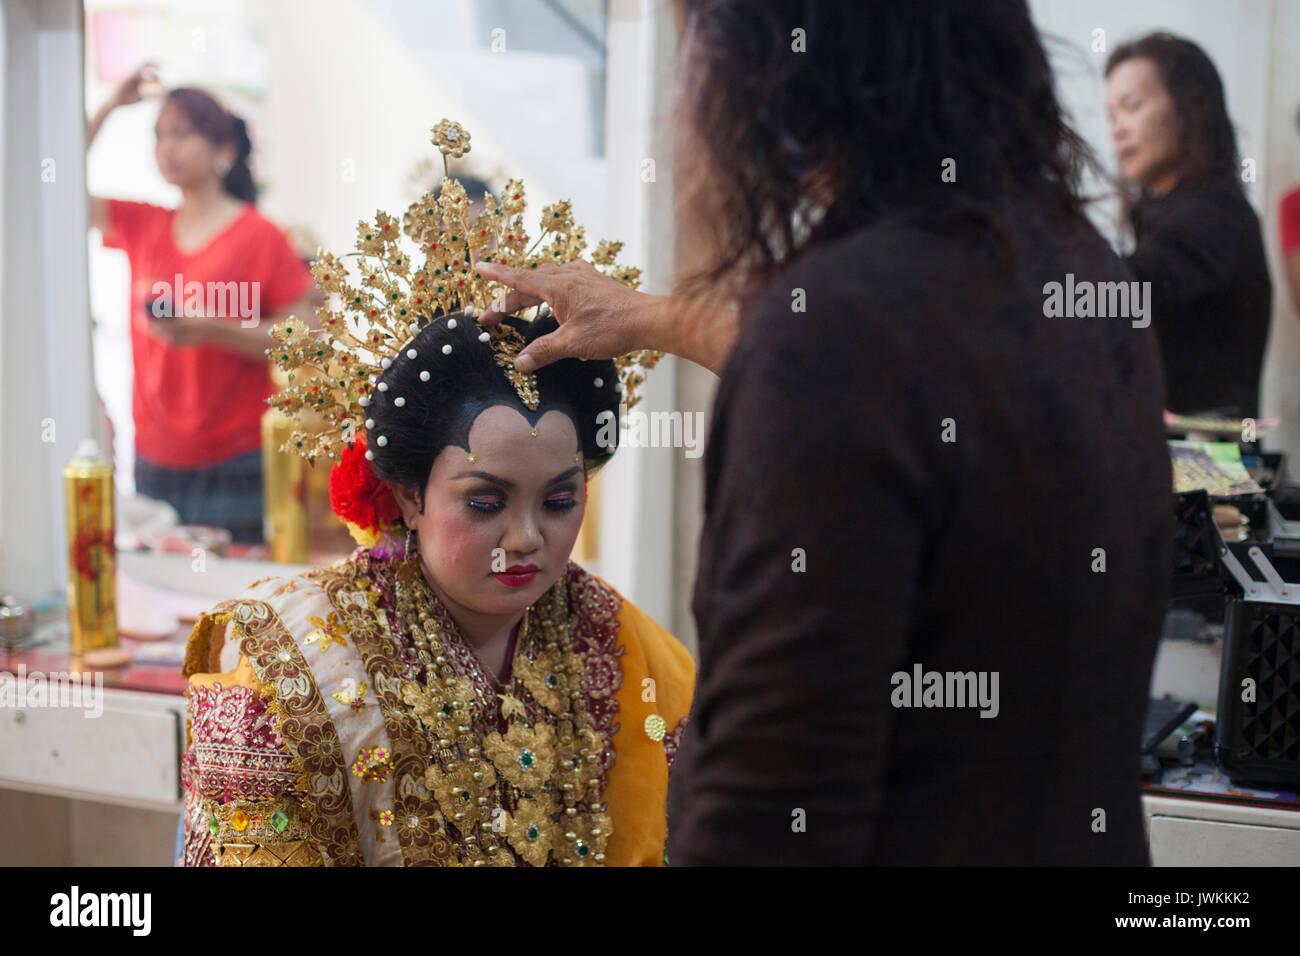 Final Blessing Stockfotos & Final Blessing Bilder - Alamy